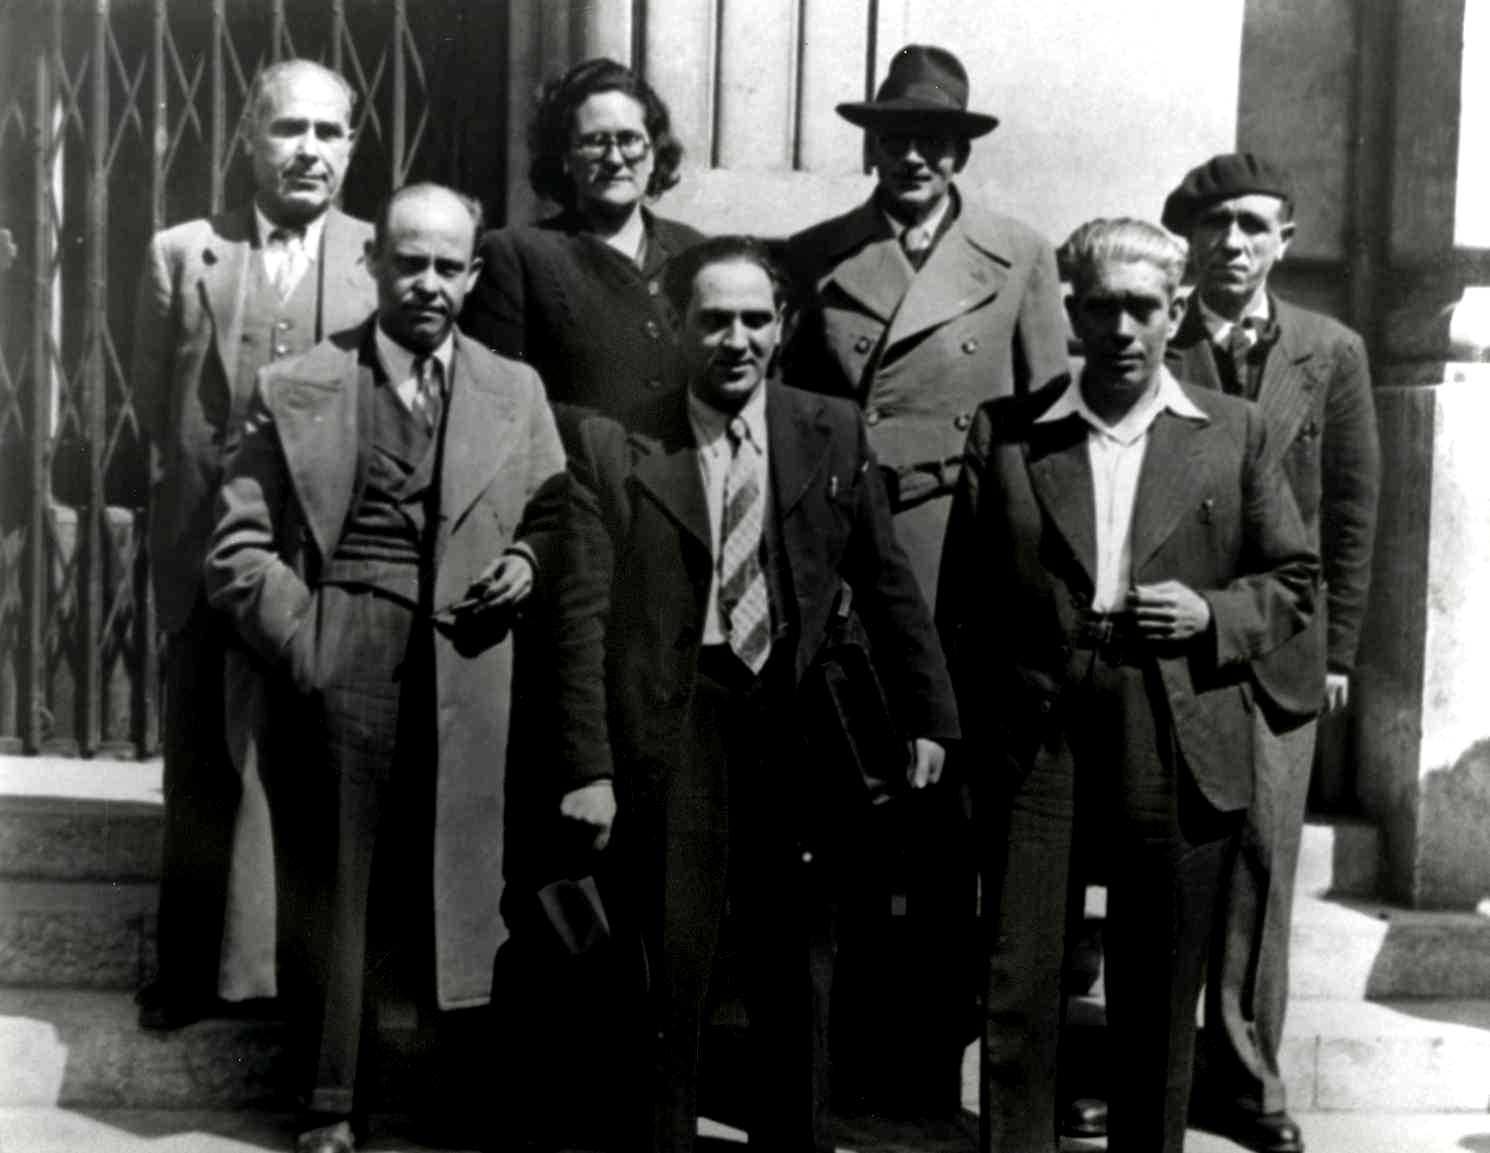 Segunda fila: Francisco Isgleas, Federica Montseny, Germinal Esgleas y Blanco.Primer plano: Laureano Cerrada, Fernando Gómez Peláez y Esteban Navarro (Francia, 11-04-1946)